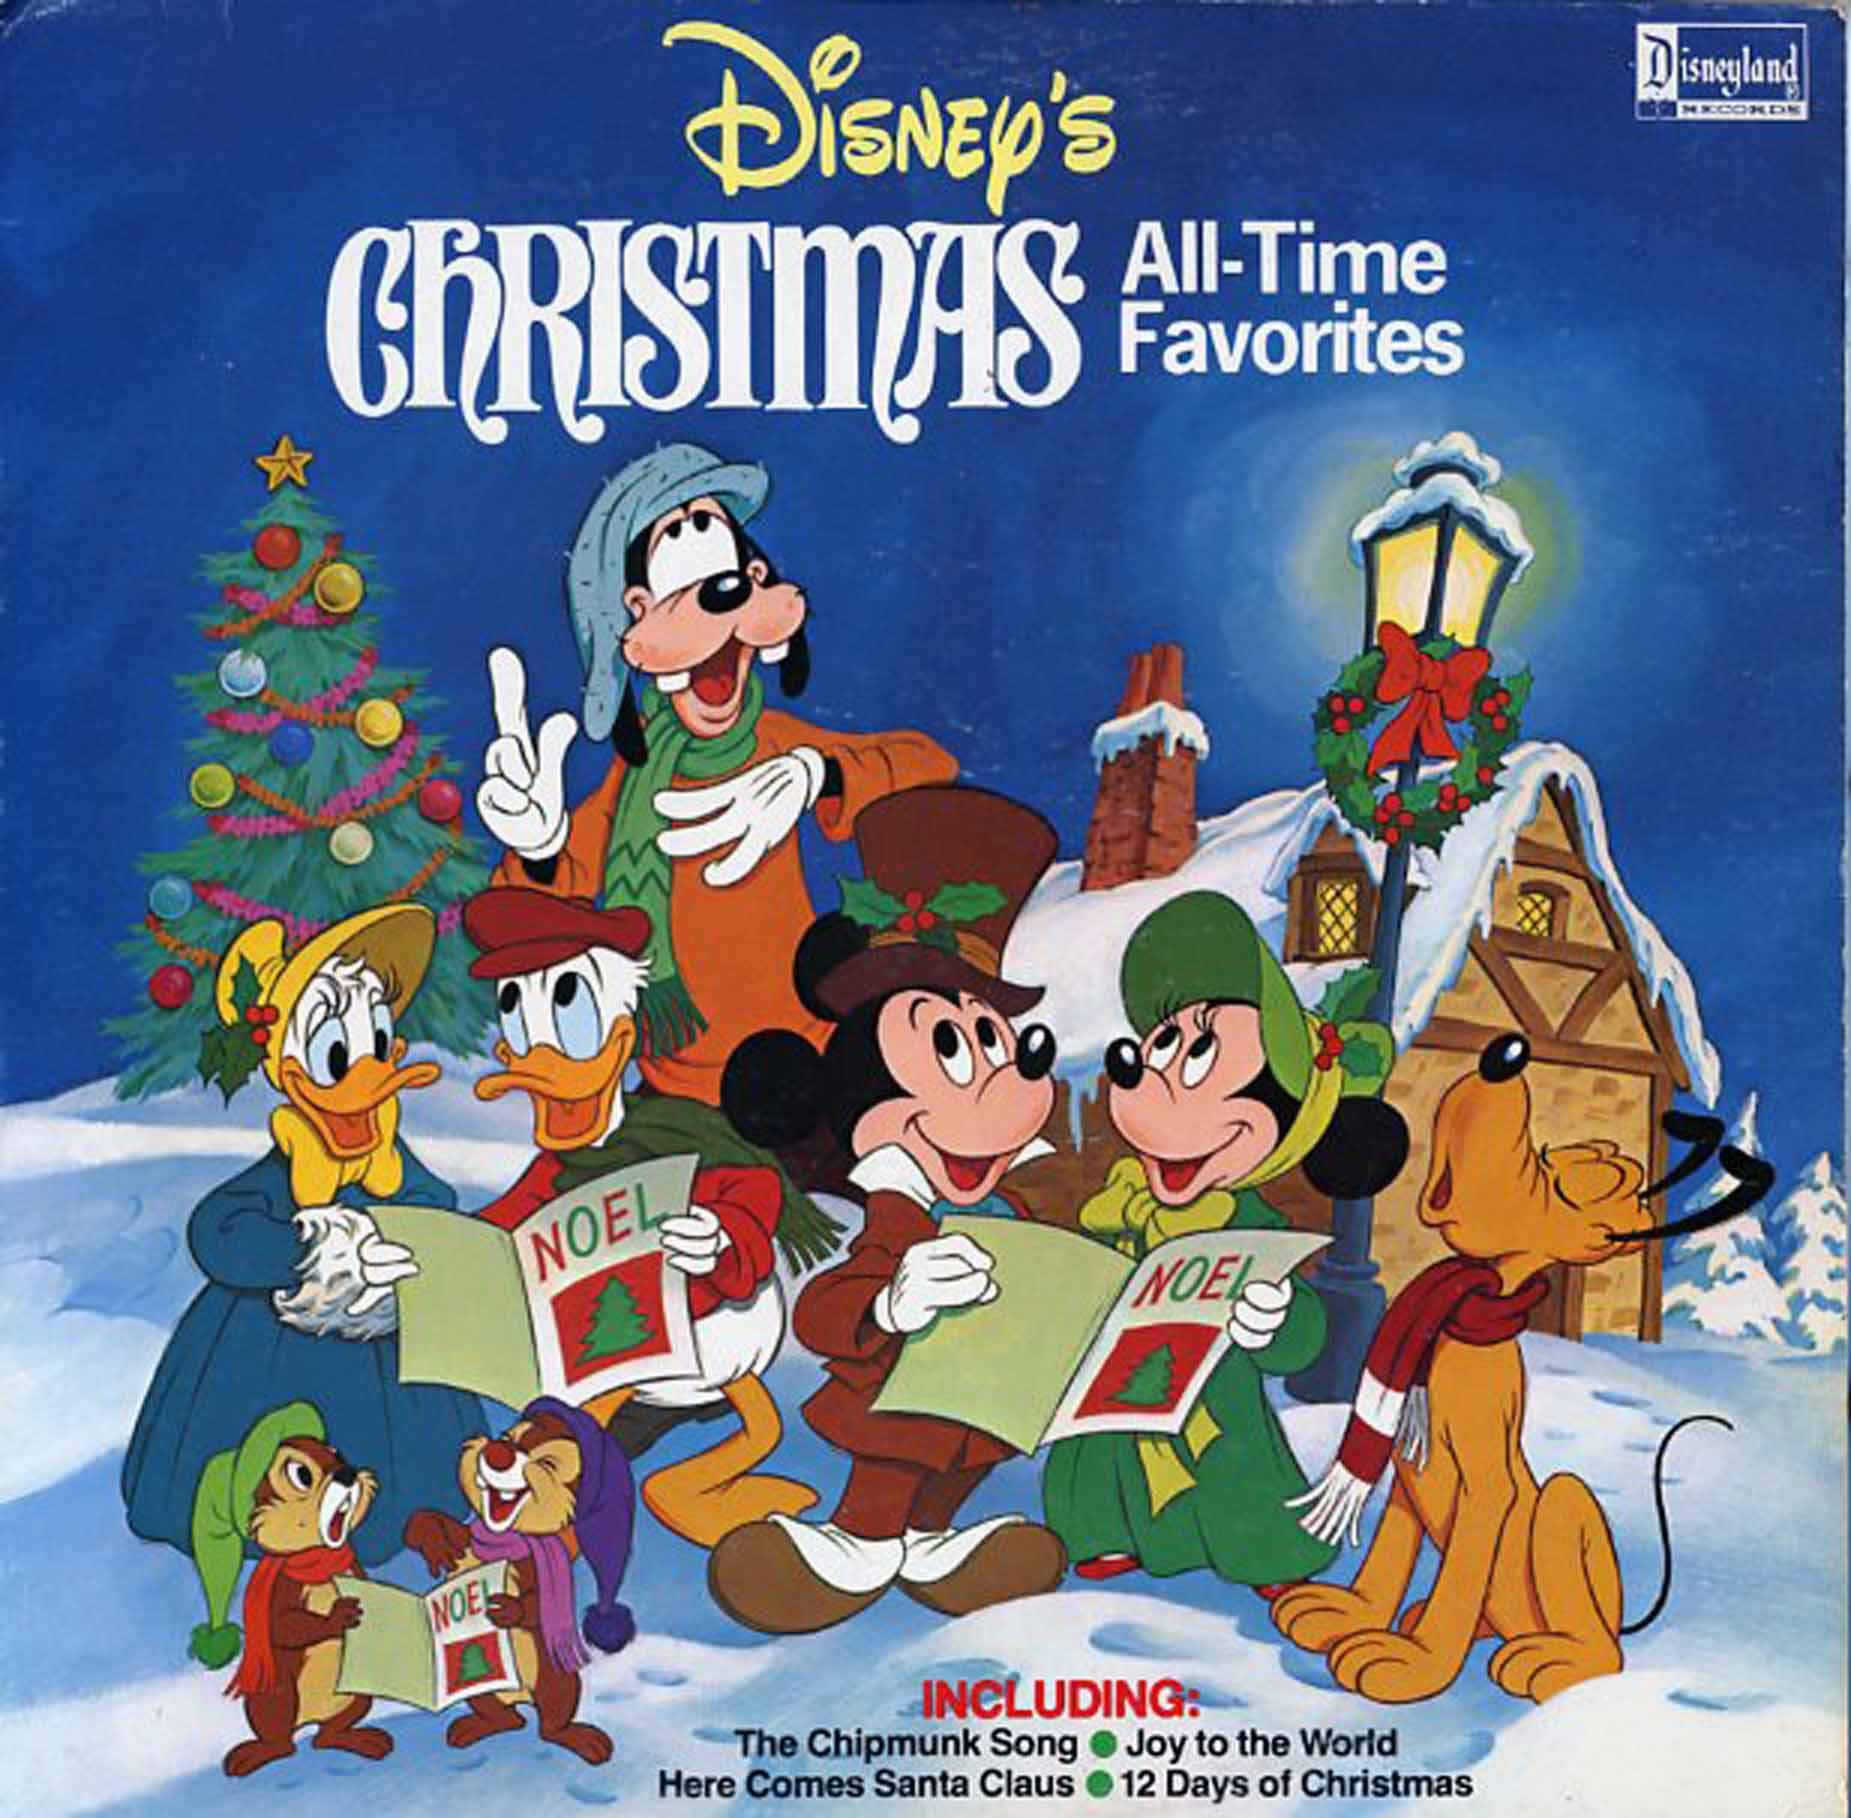 Disney's Christmas All-Time Favorites | Disney Wiki | FANDOM powered ...